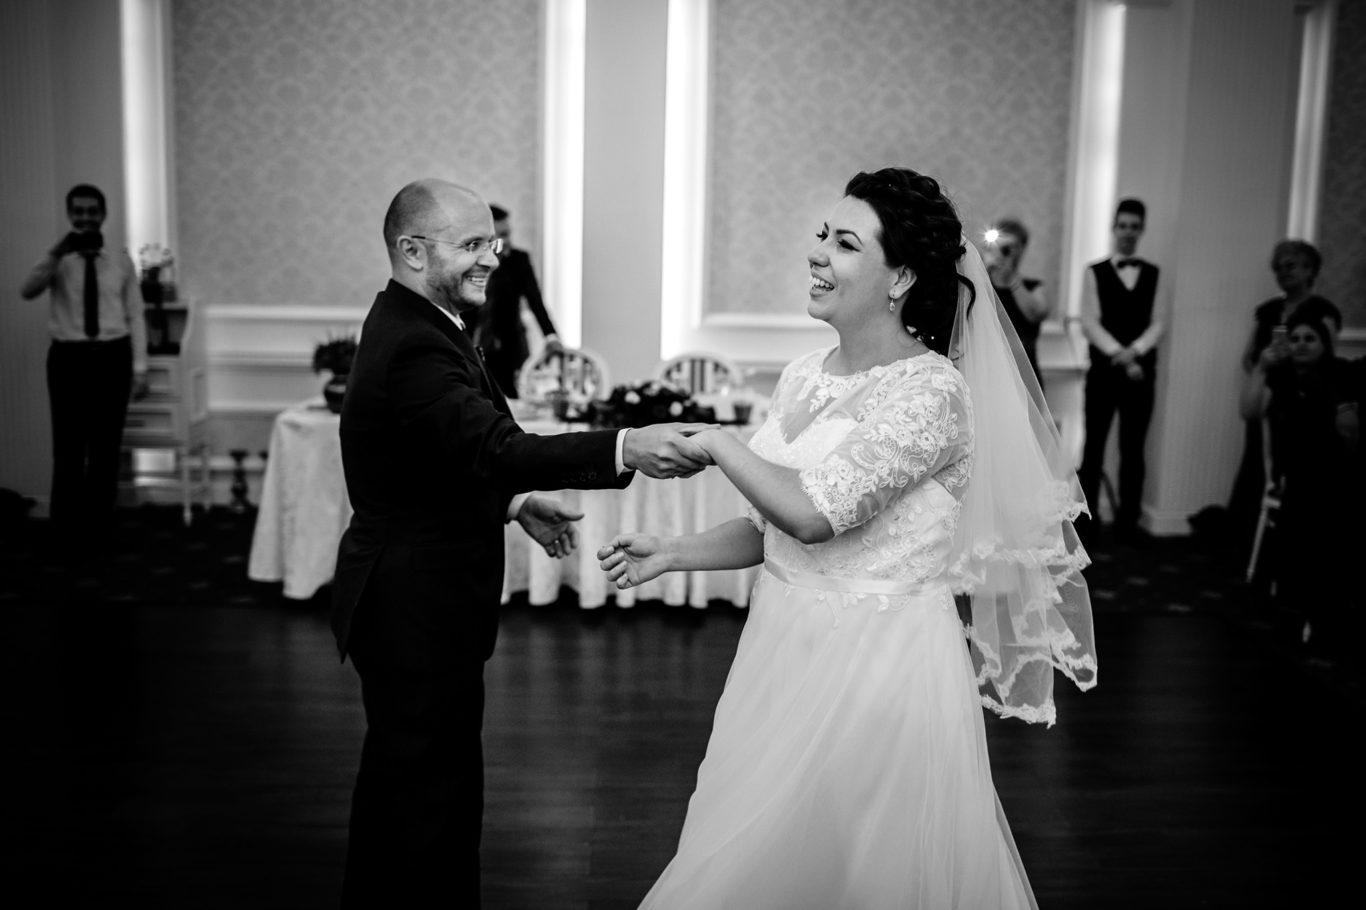 0550-fotografie-nunta-bucuresti-anca-george-fotograf-ciprian-dumitrescu-dcf_5474